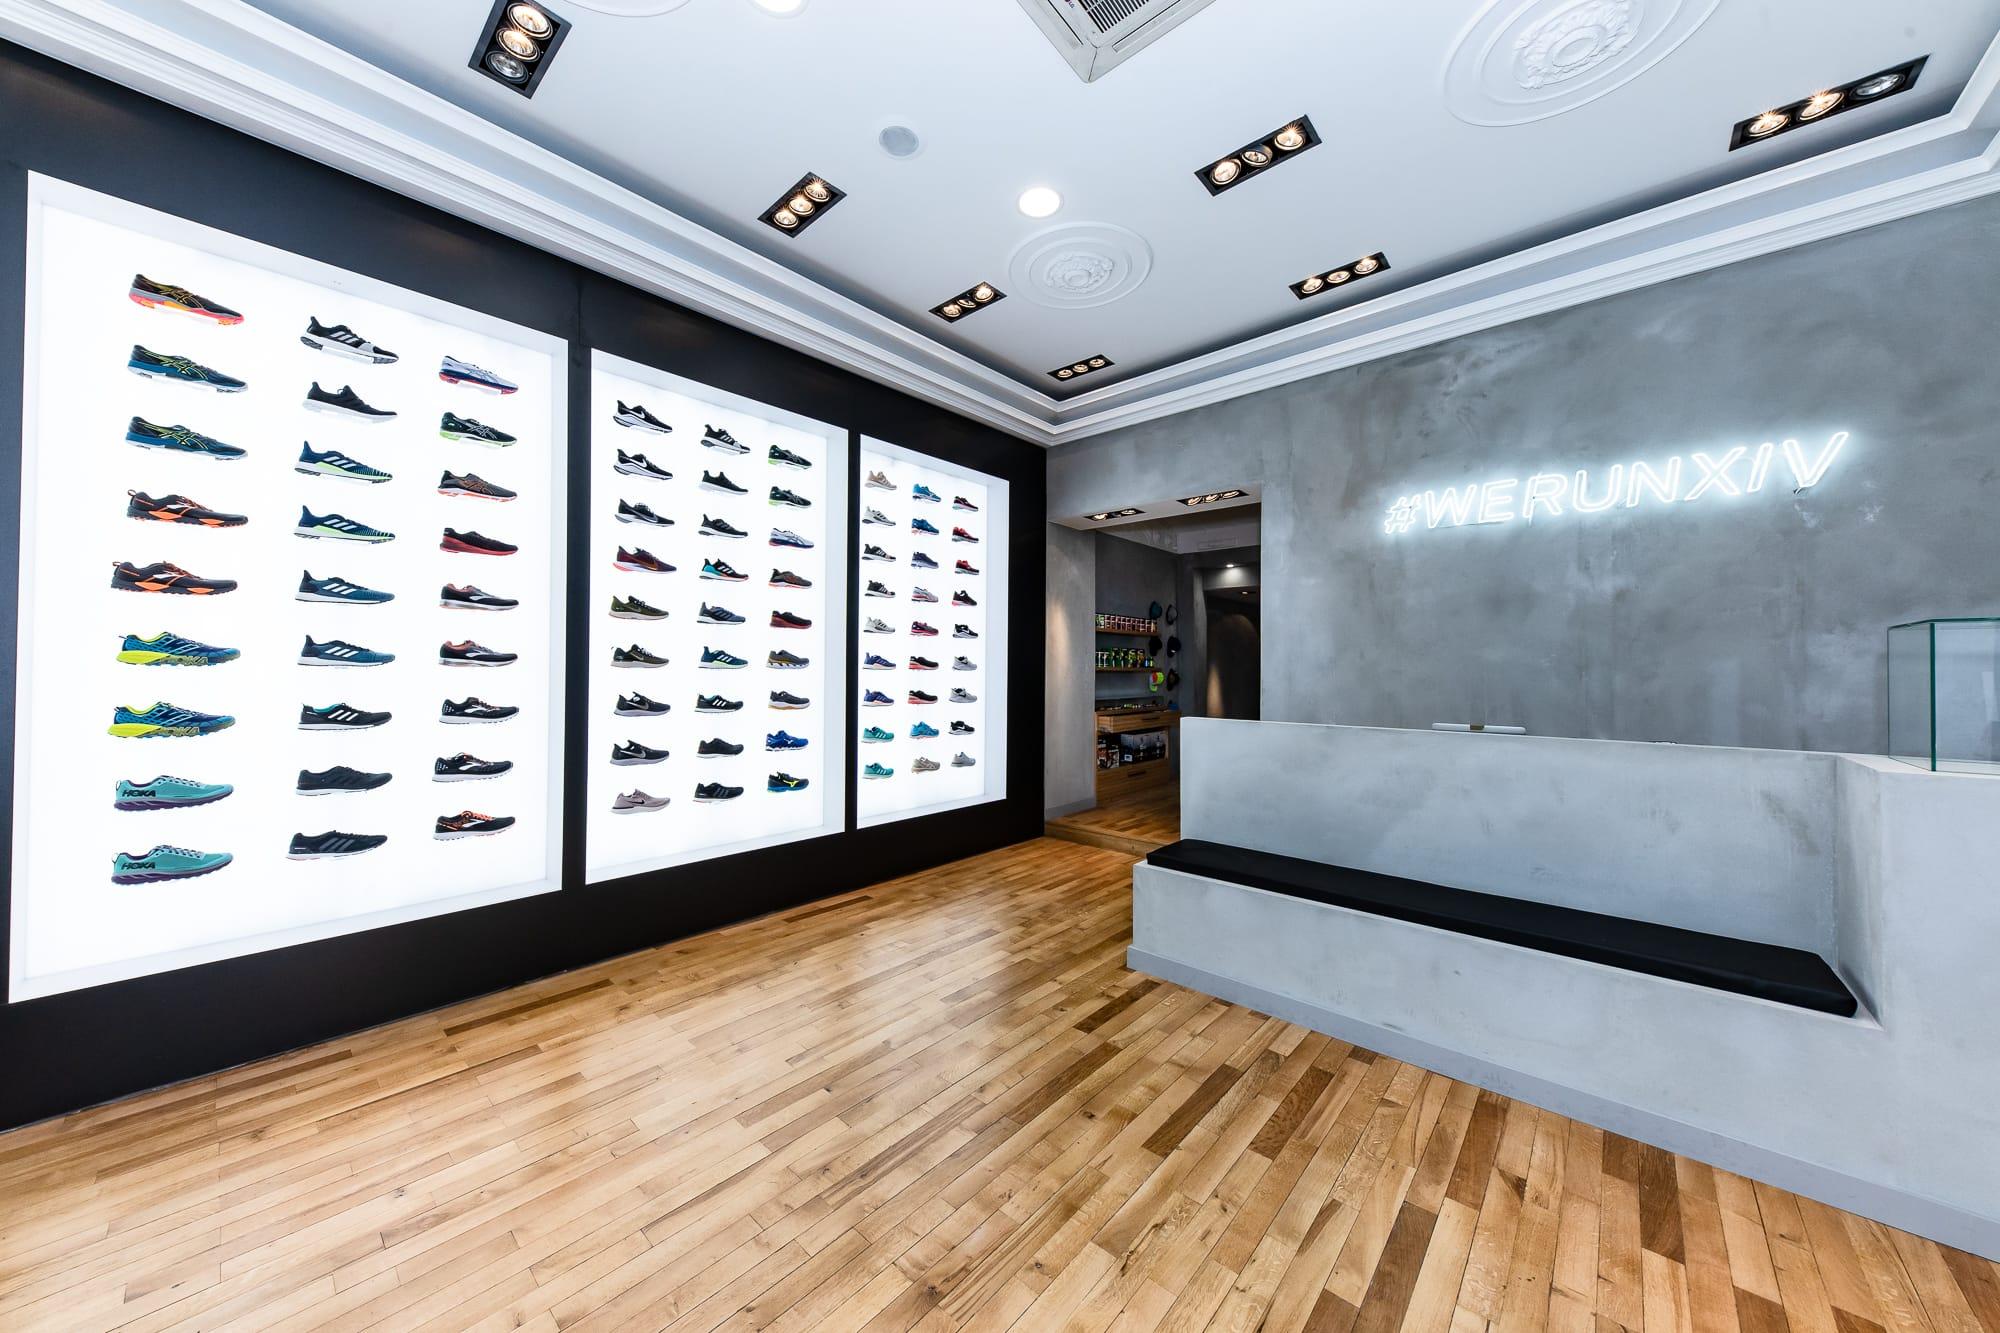 boutique de running paris